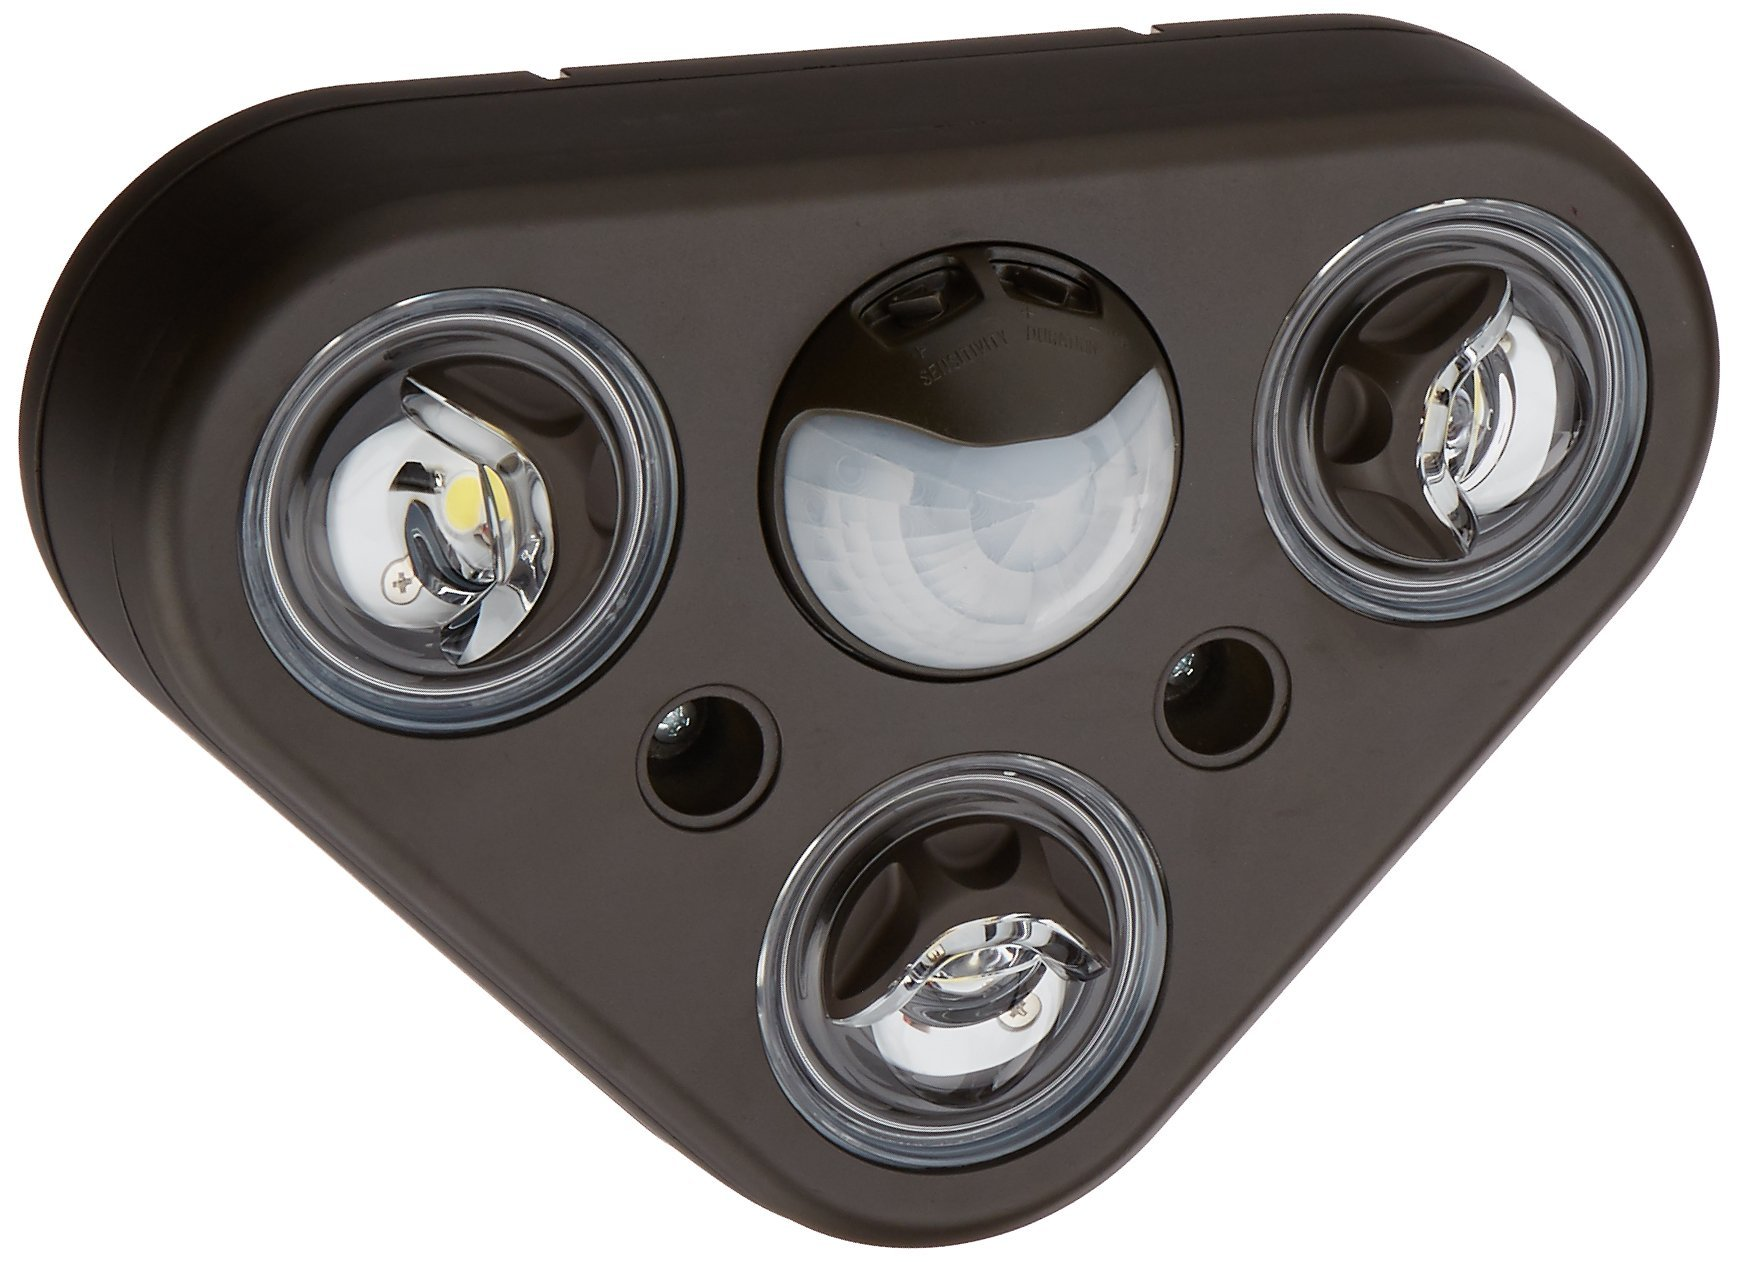 All-Pro REV32750M All-Pro Revolve Led Triple Head 270 Degree Motion Security Light, 2400 Lumens, Bronze, 5000K